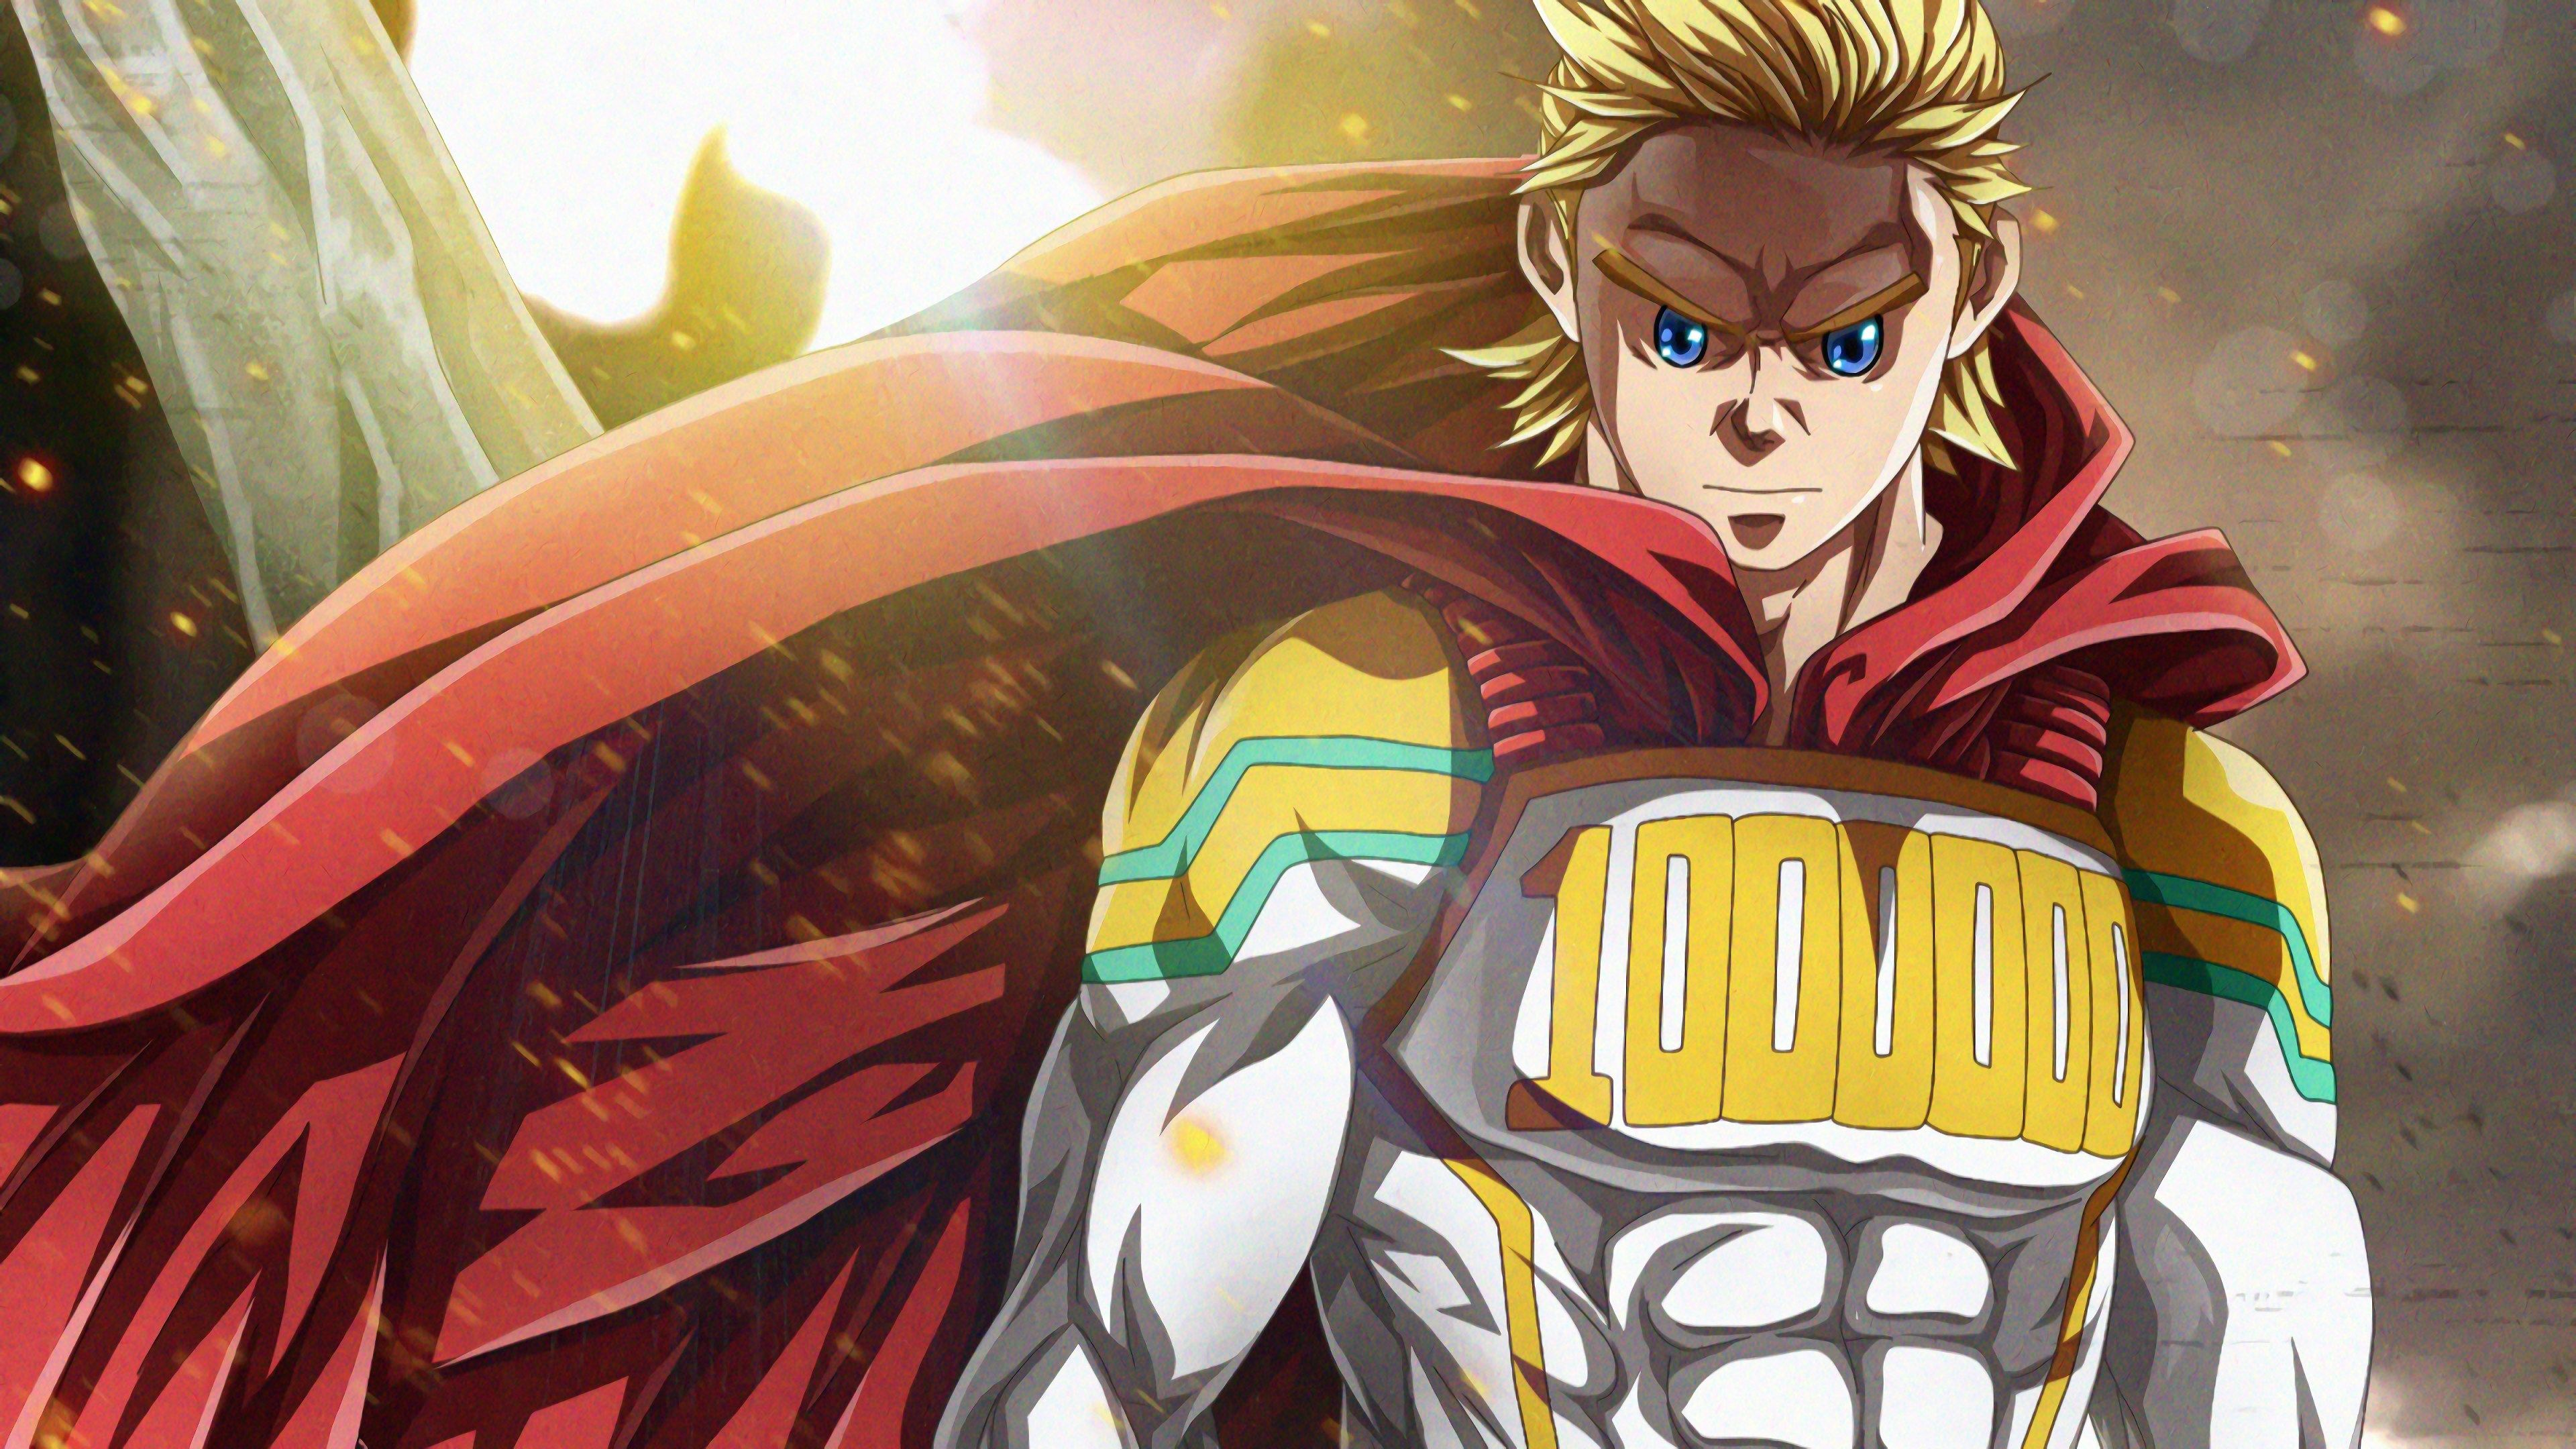 Lemillion Mirio Togata 4k 8k Hd My Hero Academia Boku No Hero